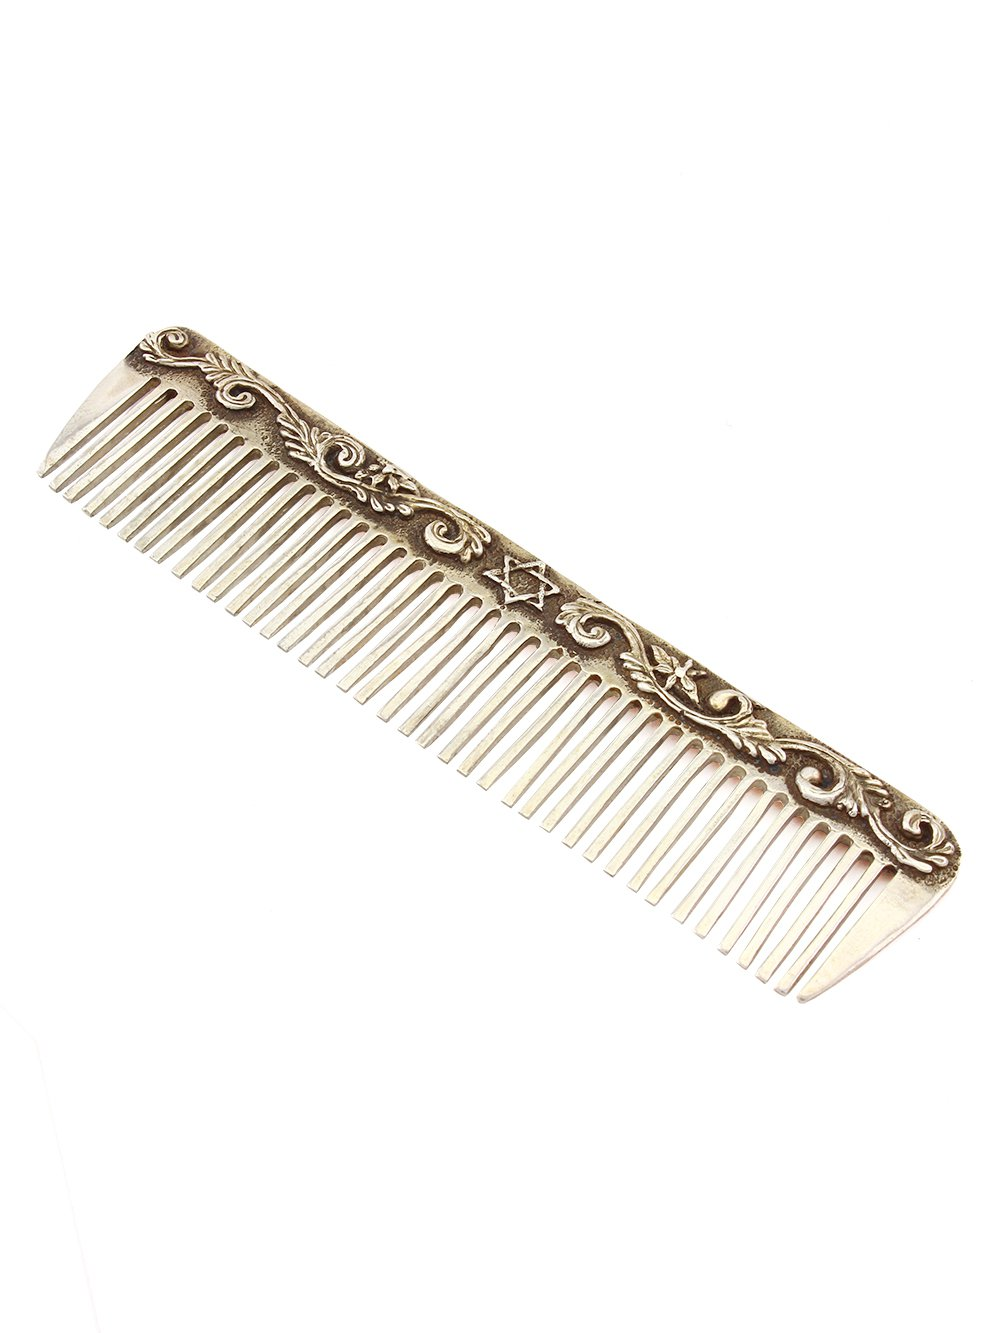 "Hair comb ""Star of David"""